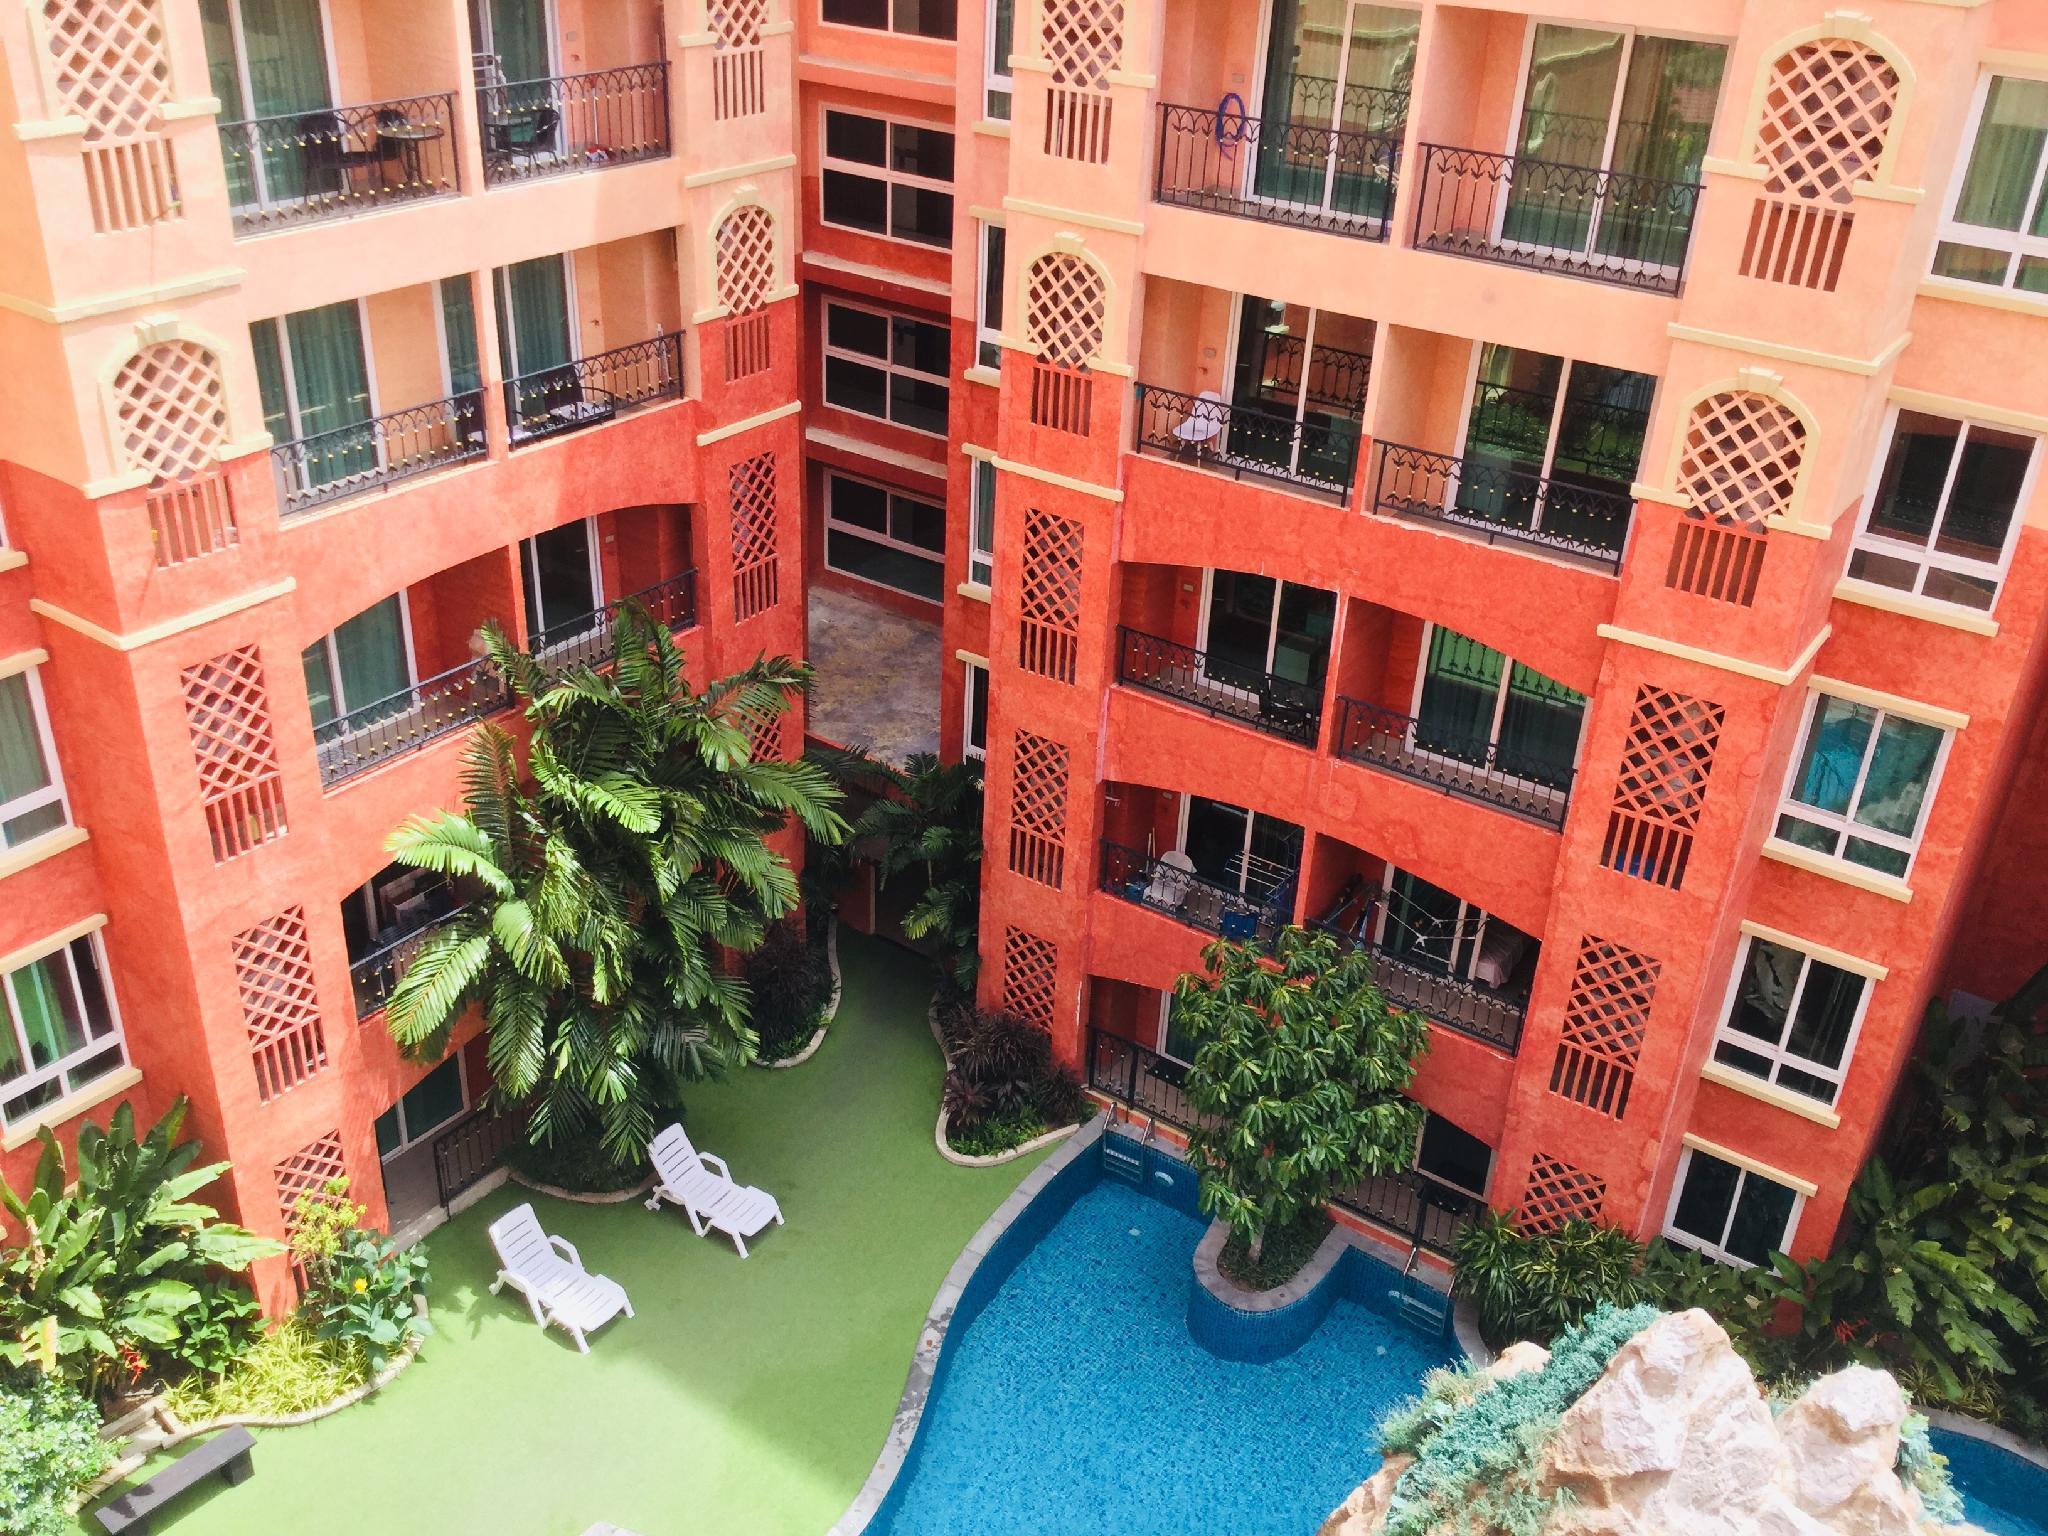 Seven Seas Condo Resort Jomtien by ABG อพาร์ตเมนต์ 1 ห้องนอน 1 ห้องน้ำส่วนตัว ขนาด 36 ตร.ม. – หาดจอมเทียน